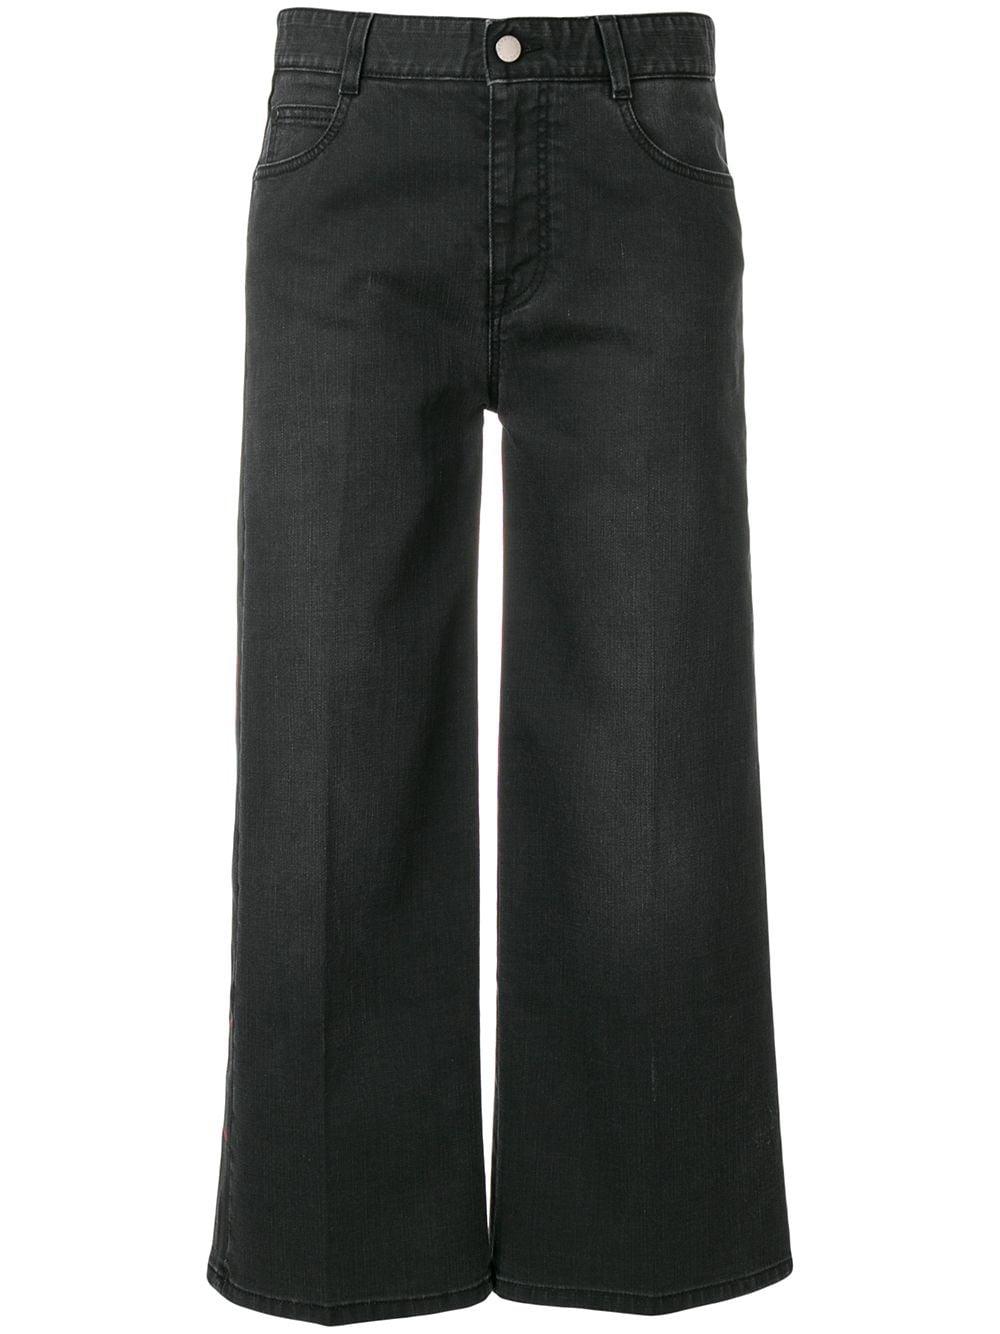 Stella McCartney | укороченные джинсы 'All Is Love' | Clouty